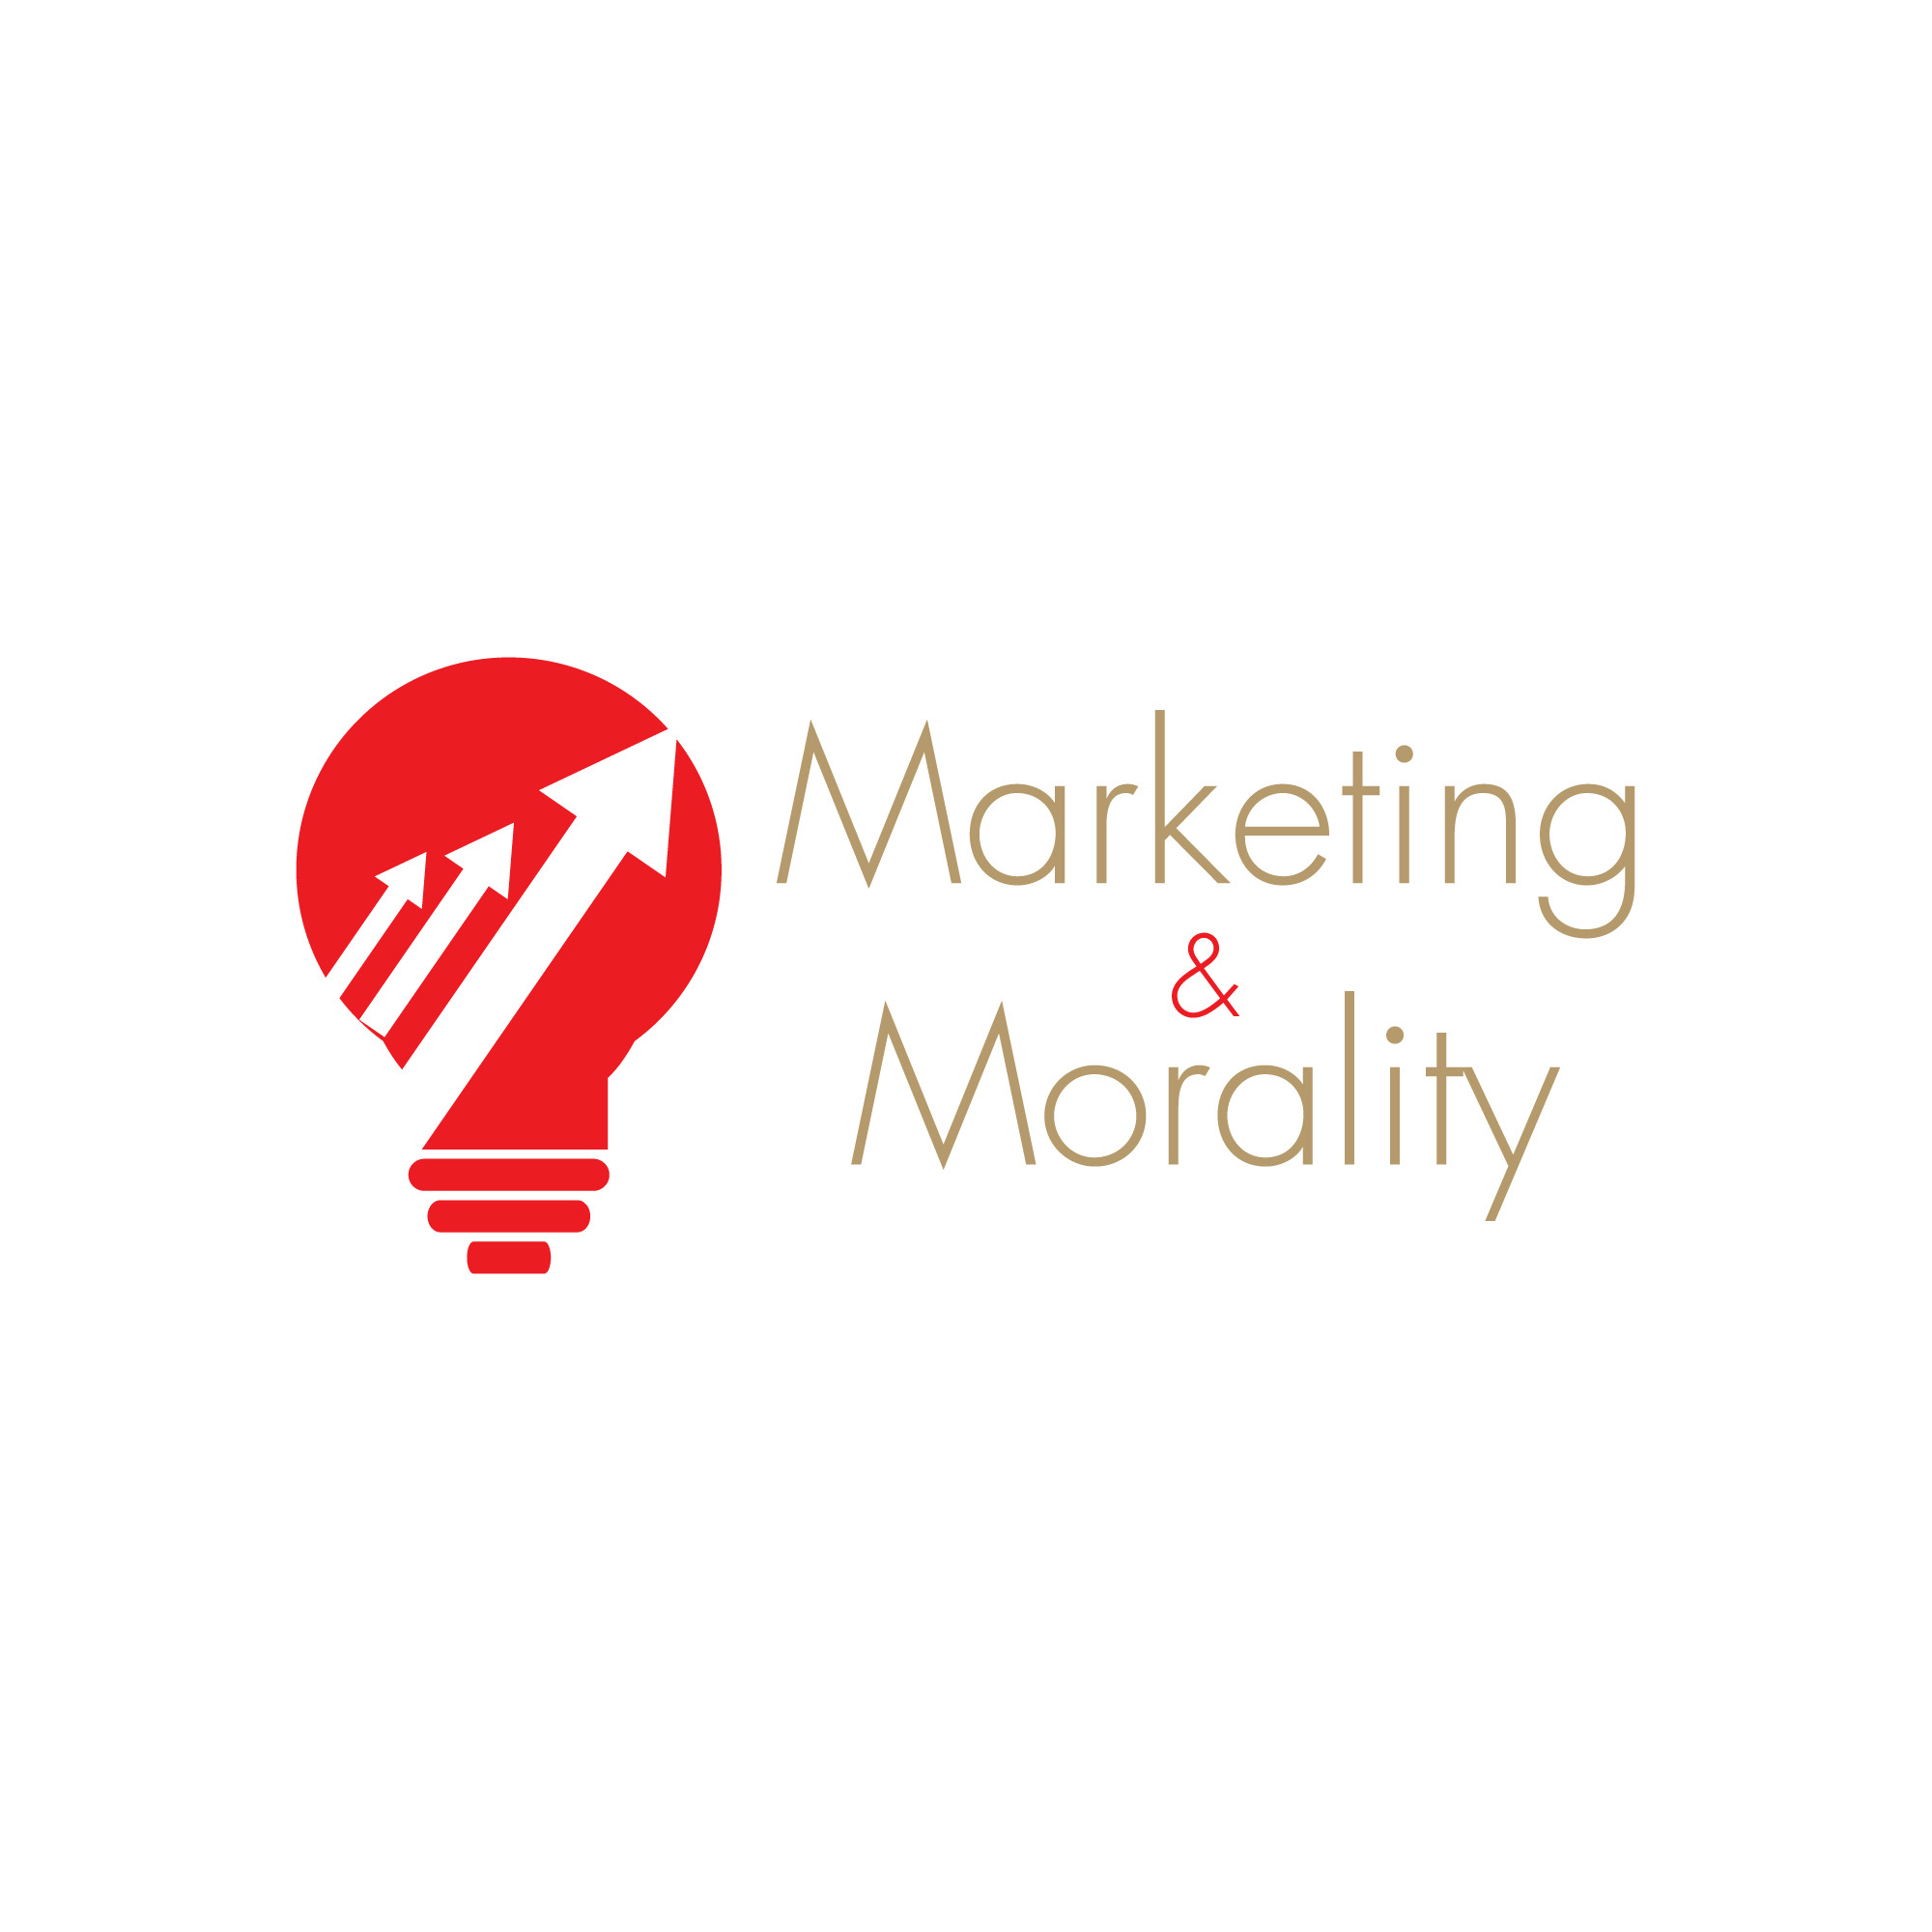 Ryan Bilodeau Marketing & Morality